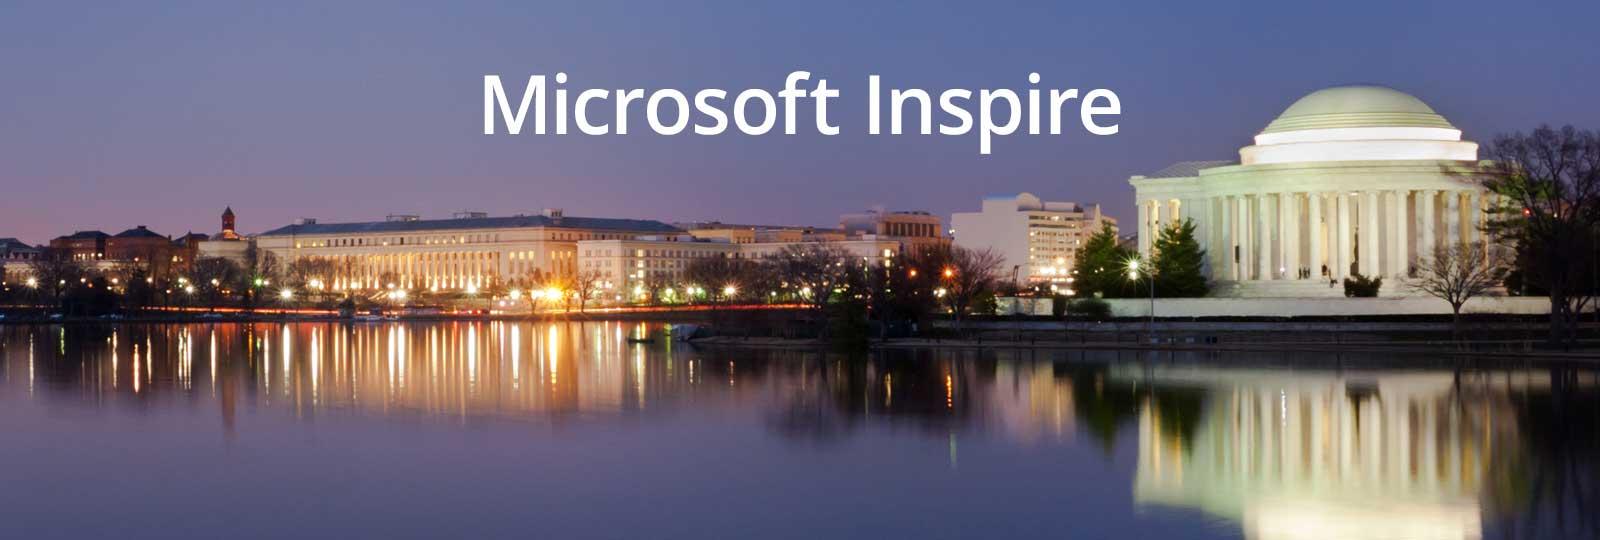 Microsoft Inspire - Wrap Up